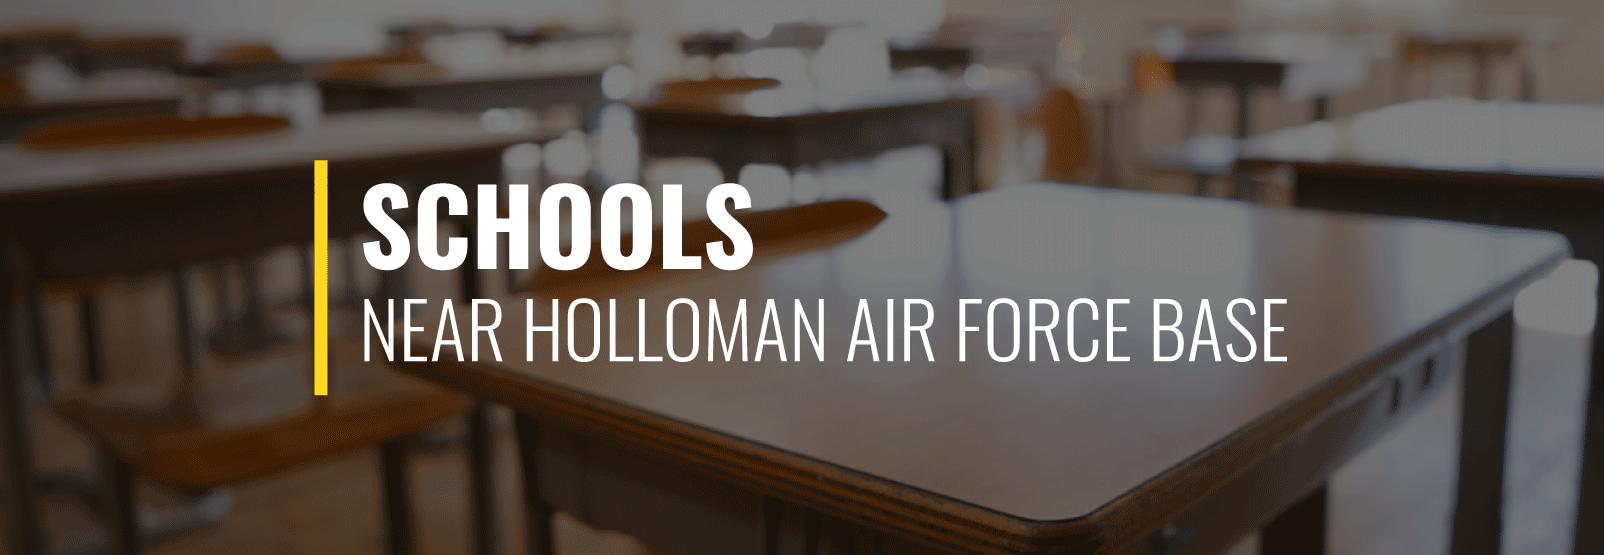 Holloman AFB Schools